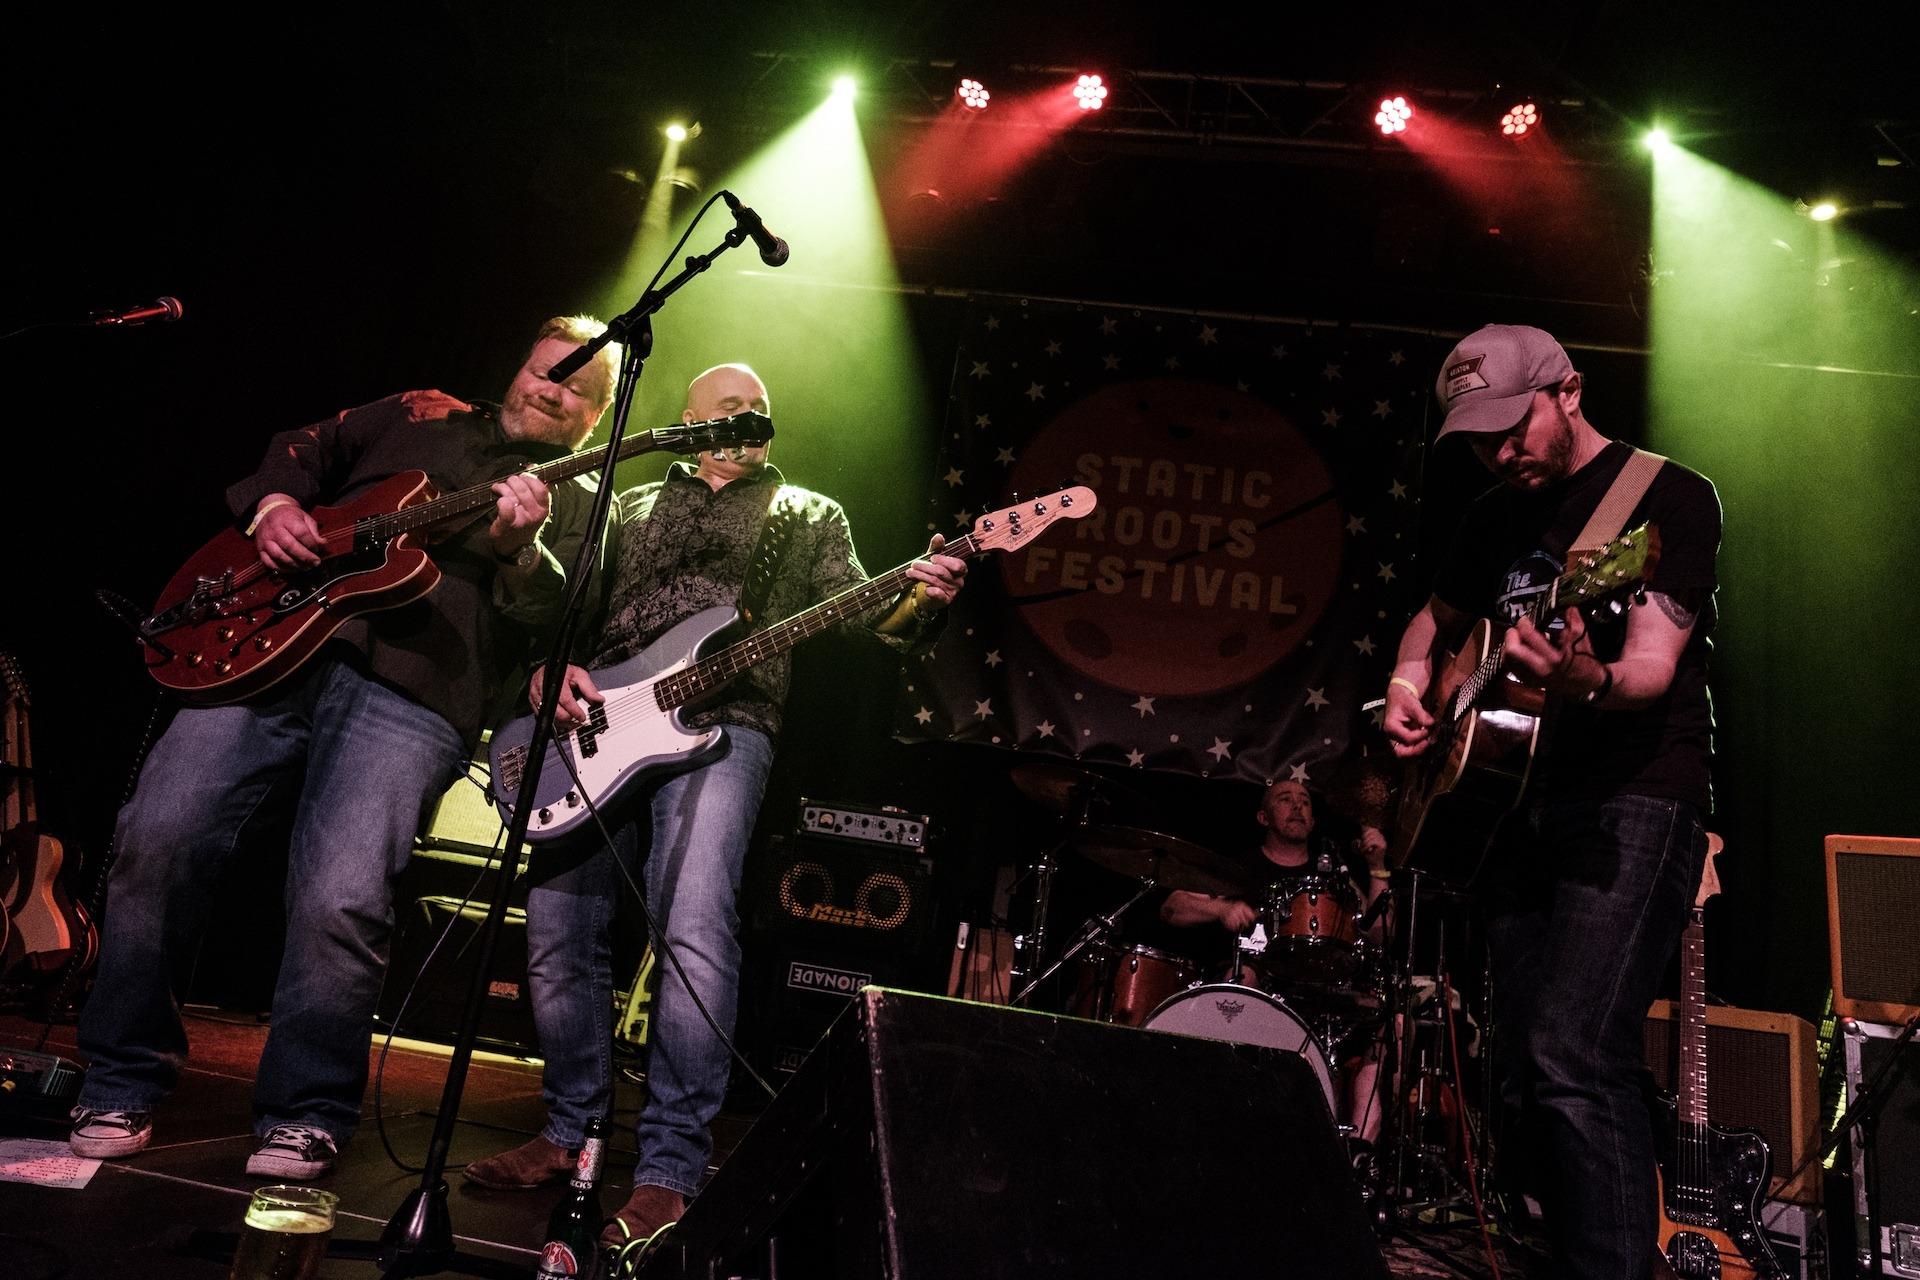 SRF 2016 - The Wynntown Marshals - Iain Sloan, Murdoch McLeod, Kenny McCabe, Keith Benzie, Static Roots Festival 2016